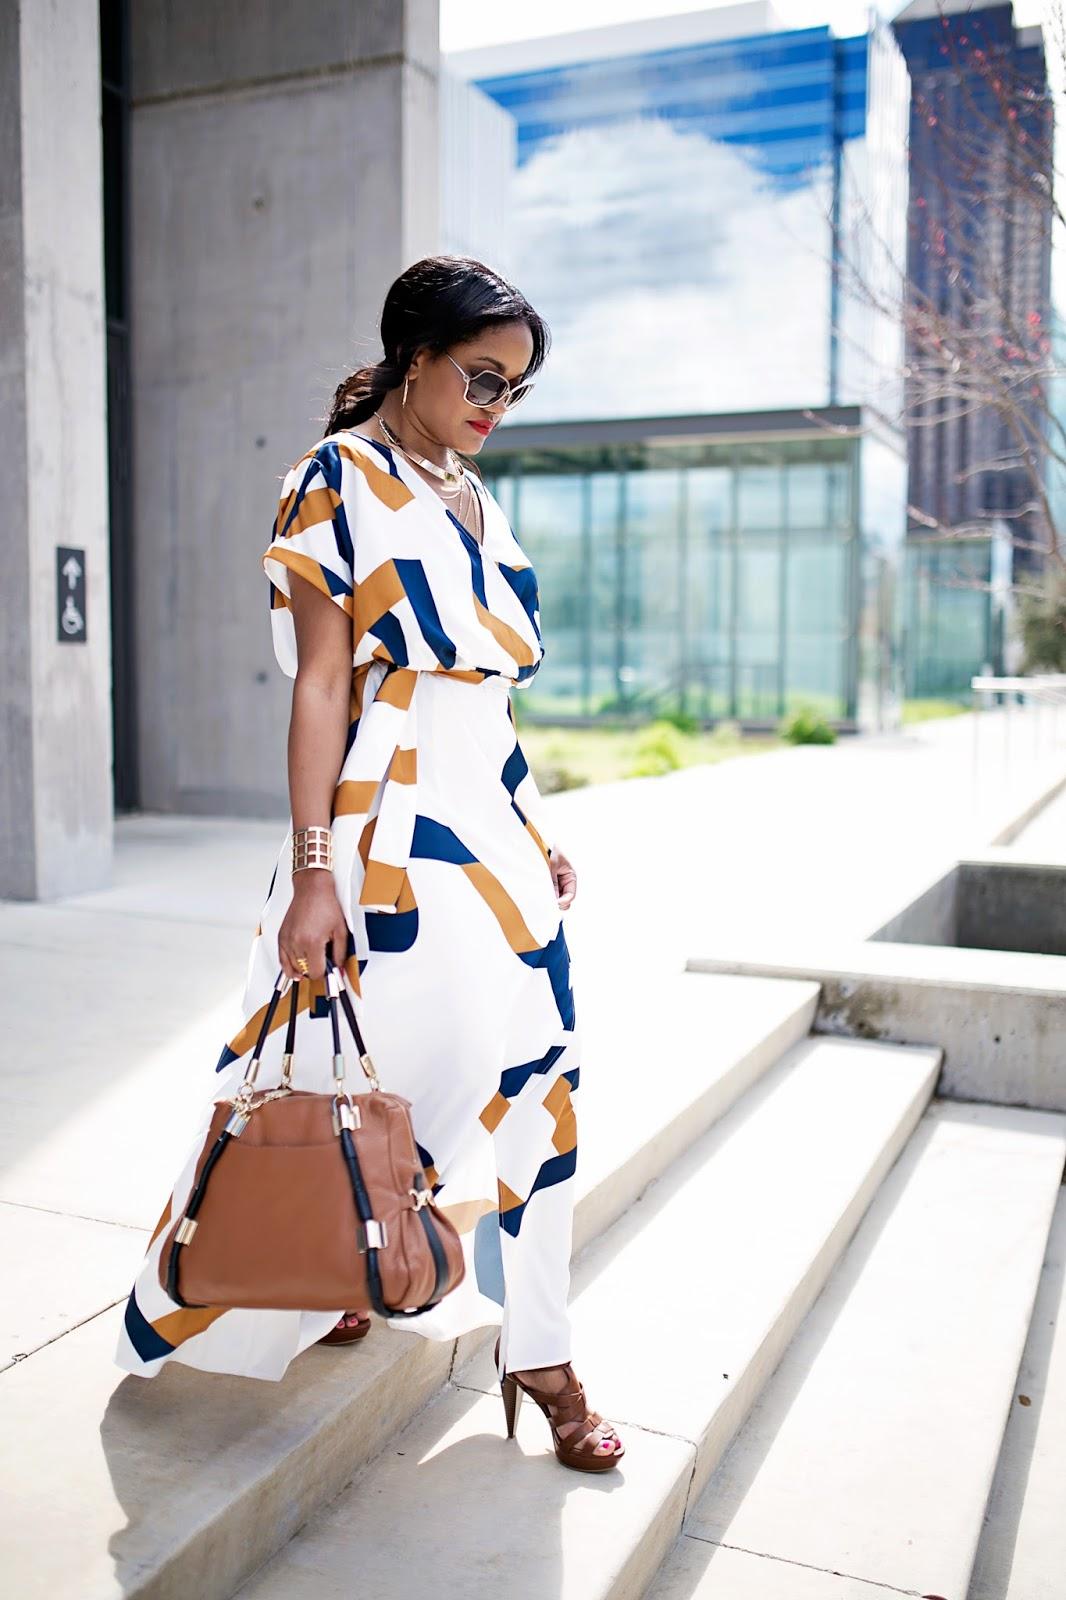 maxi dress-spring fashion- sheIn maxi dress- perfect maxi dress- how to dress up maxi dress- guess caged platform sandals, bauble bar- dallas fashion blogger- black girl fashion blogger- look for less- diane von furstenburg look for less-